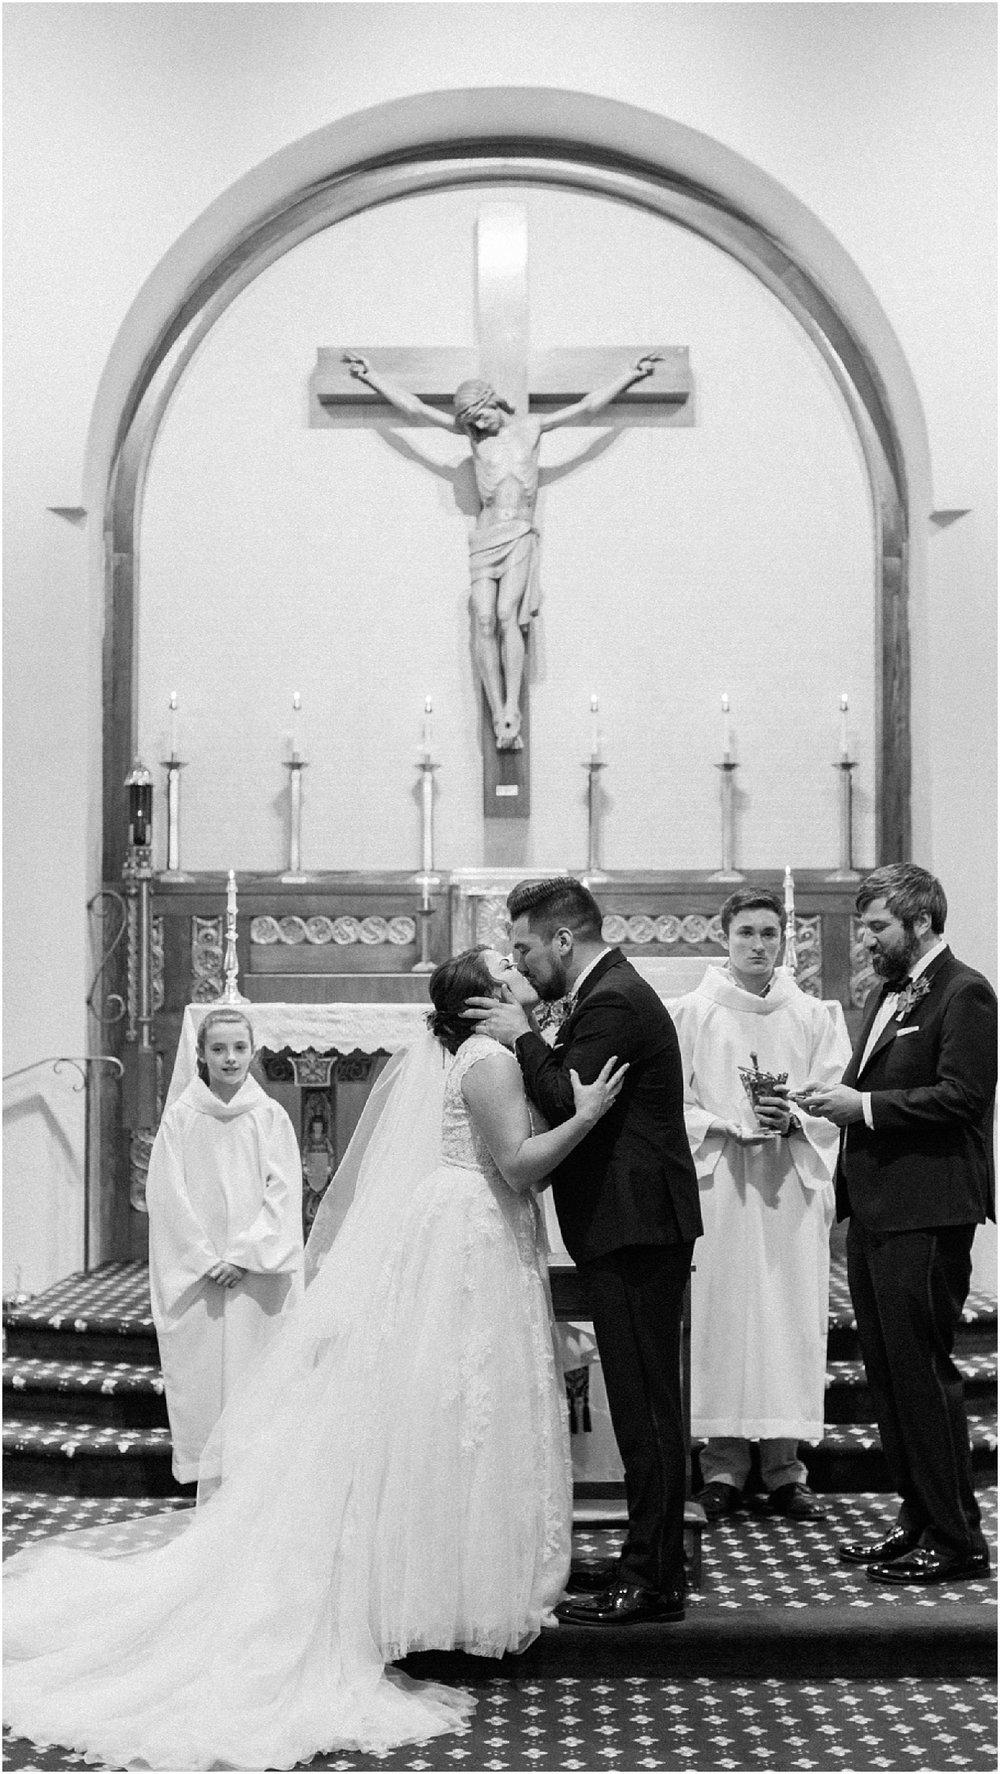 courtney_kurt_cape_cod_popponessett_inn_dowses_beach_boston_wedding_meredith_jane_photography_photo_0034.jpg